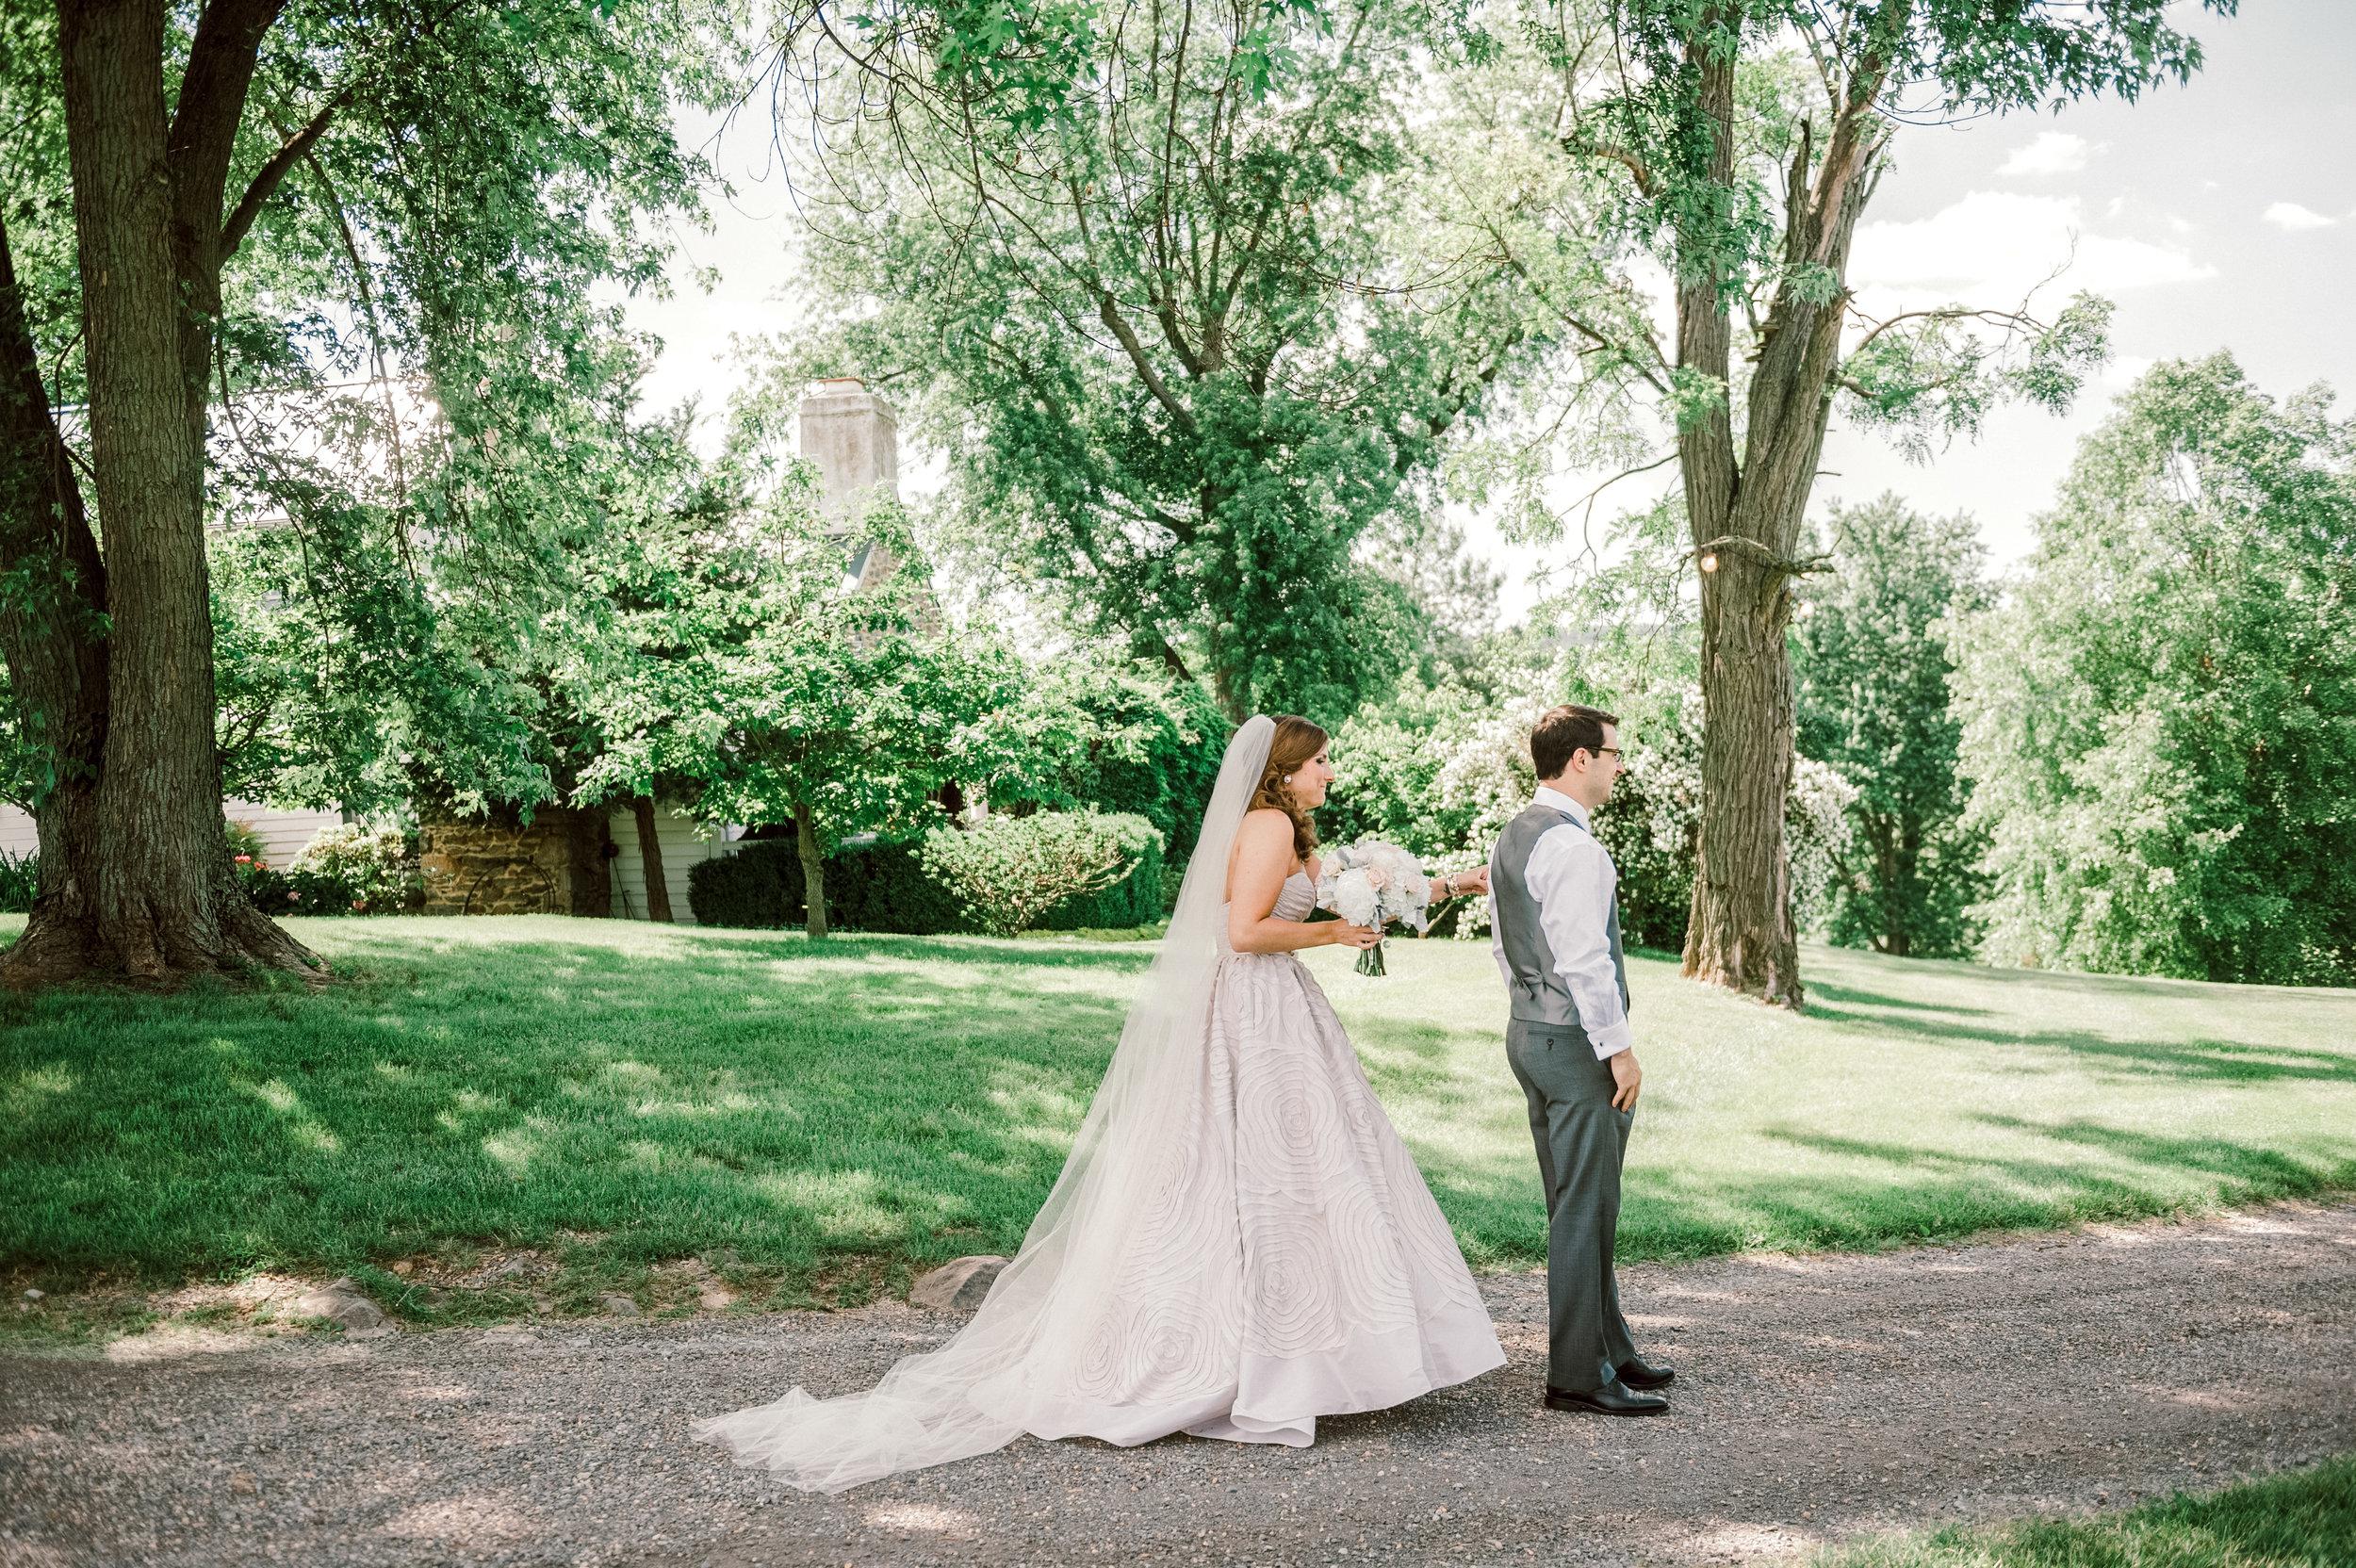 Silverbrook-Farm-Weddings-Virginia-13.jpg